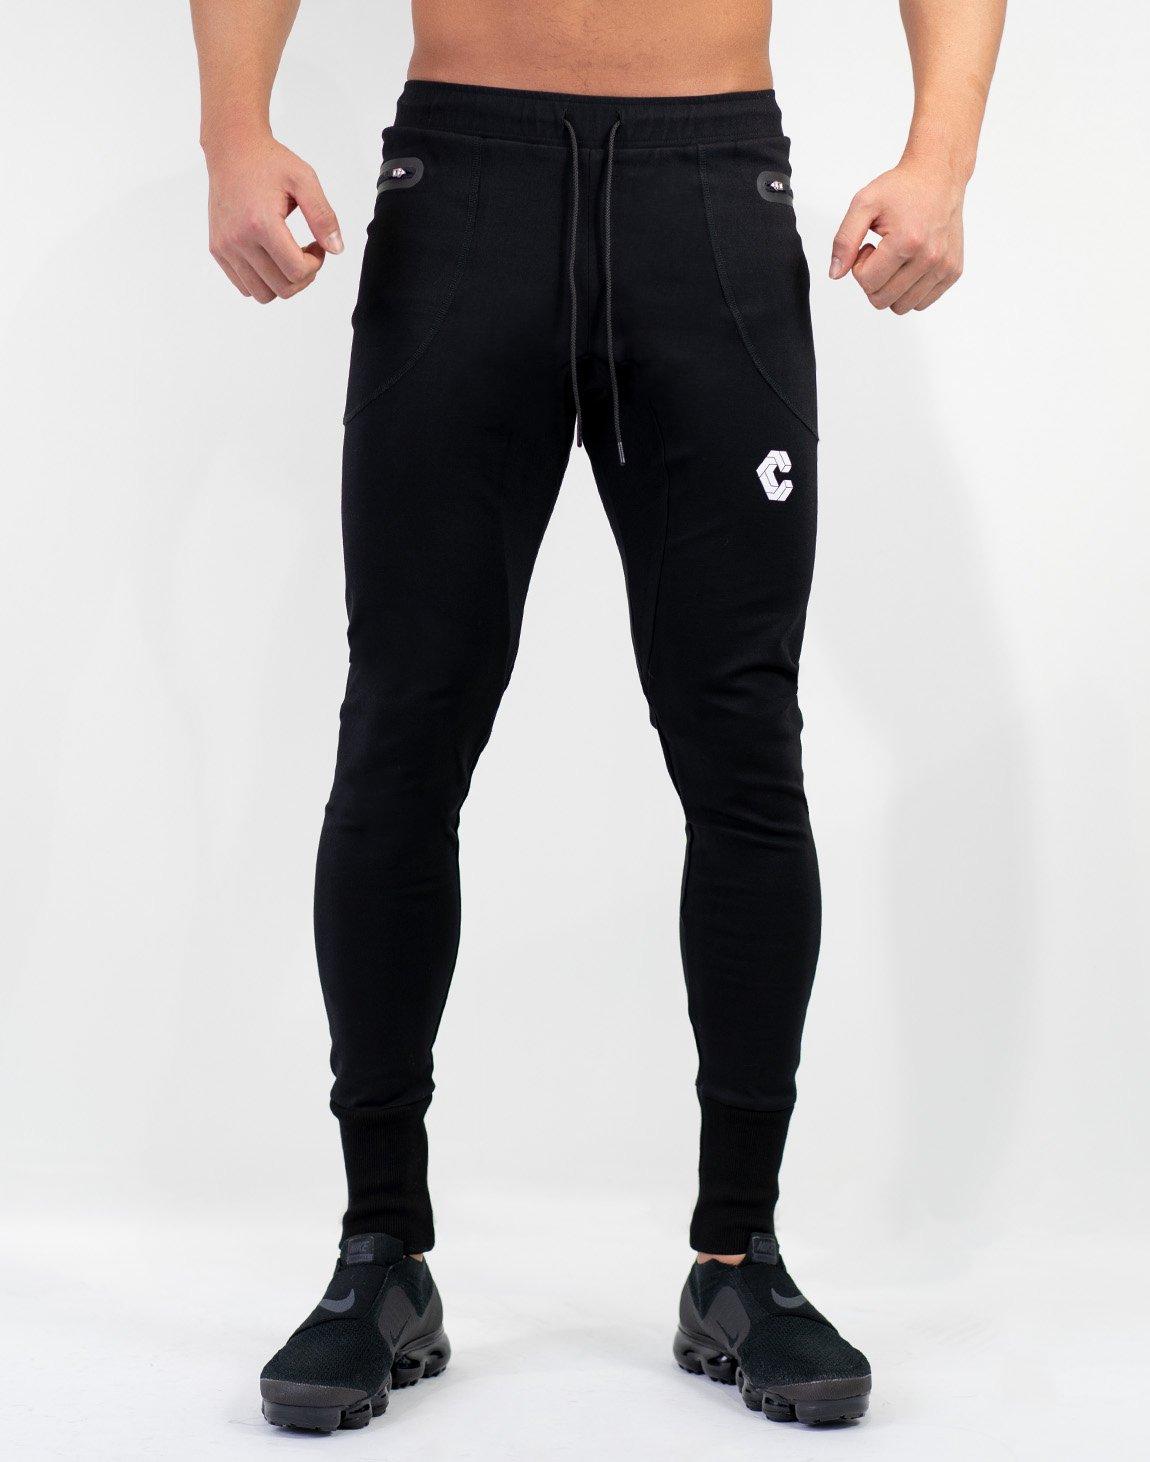 <img class='new_mark_img1' src='https://img.shop-pro.jp/img/new/icons55.gif' style='border:none;display:inline;margin:0px;padding:0px;width:auto;' />Mode Calf Logo jogger Pants Black